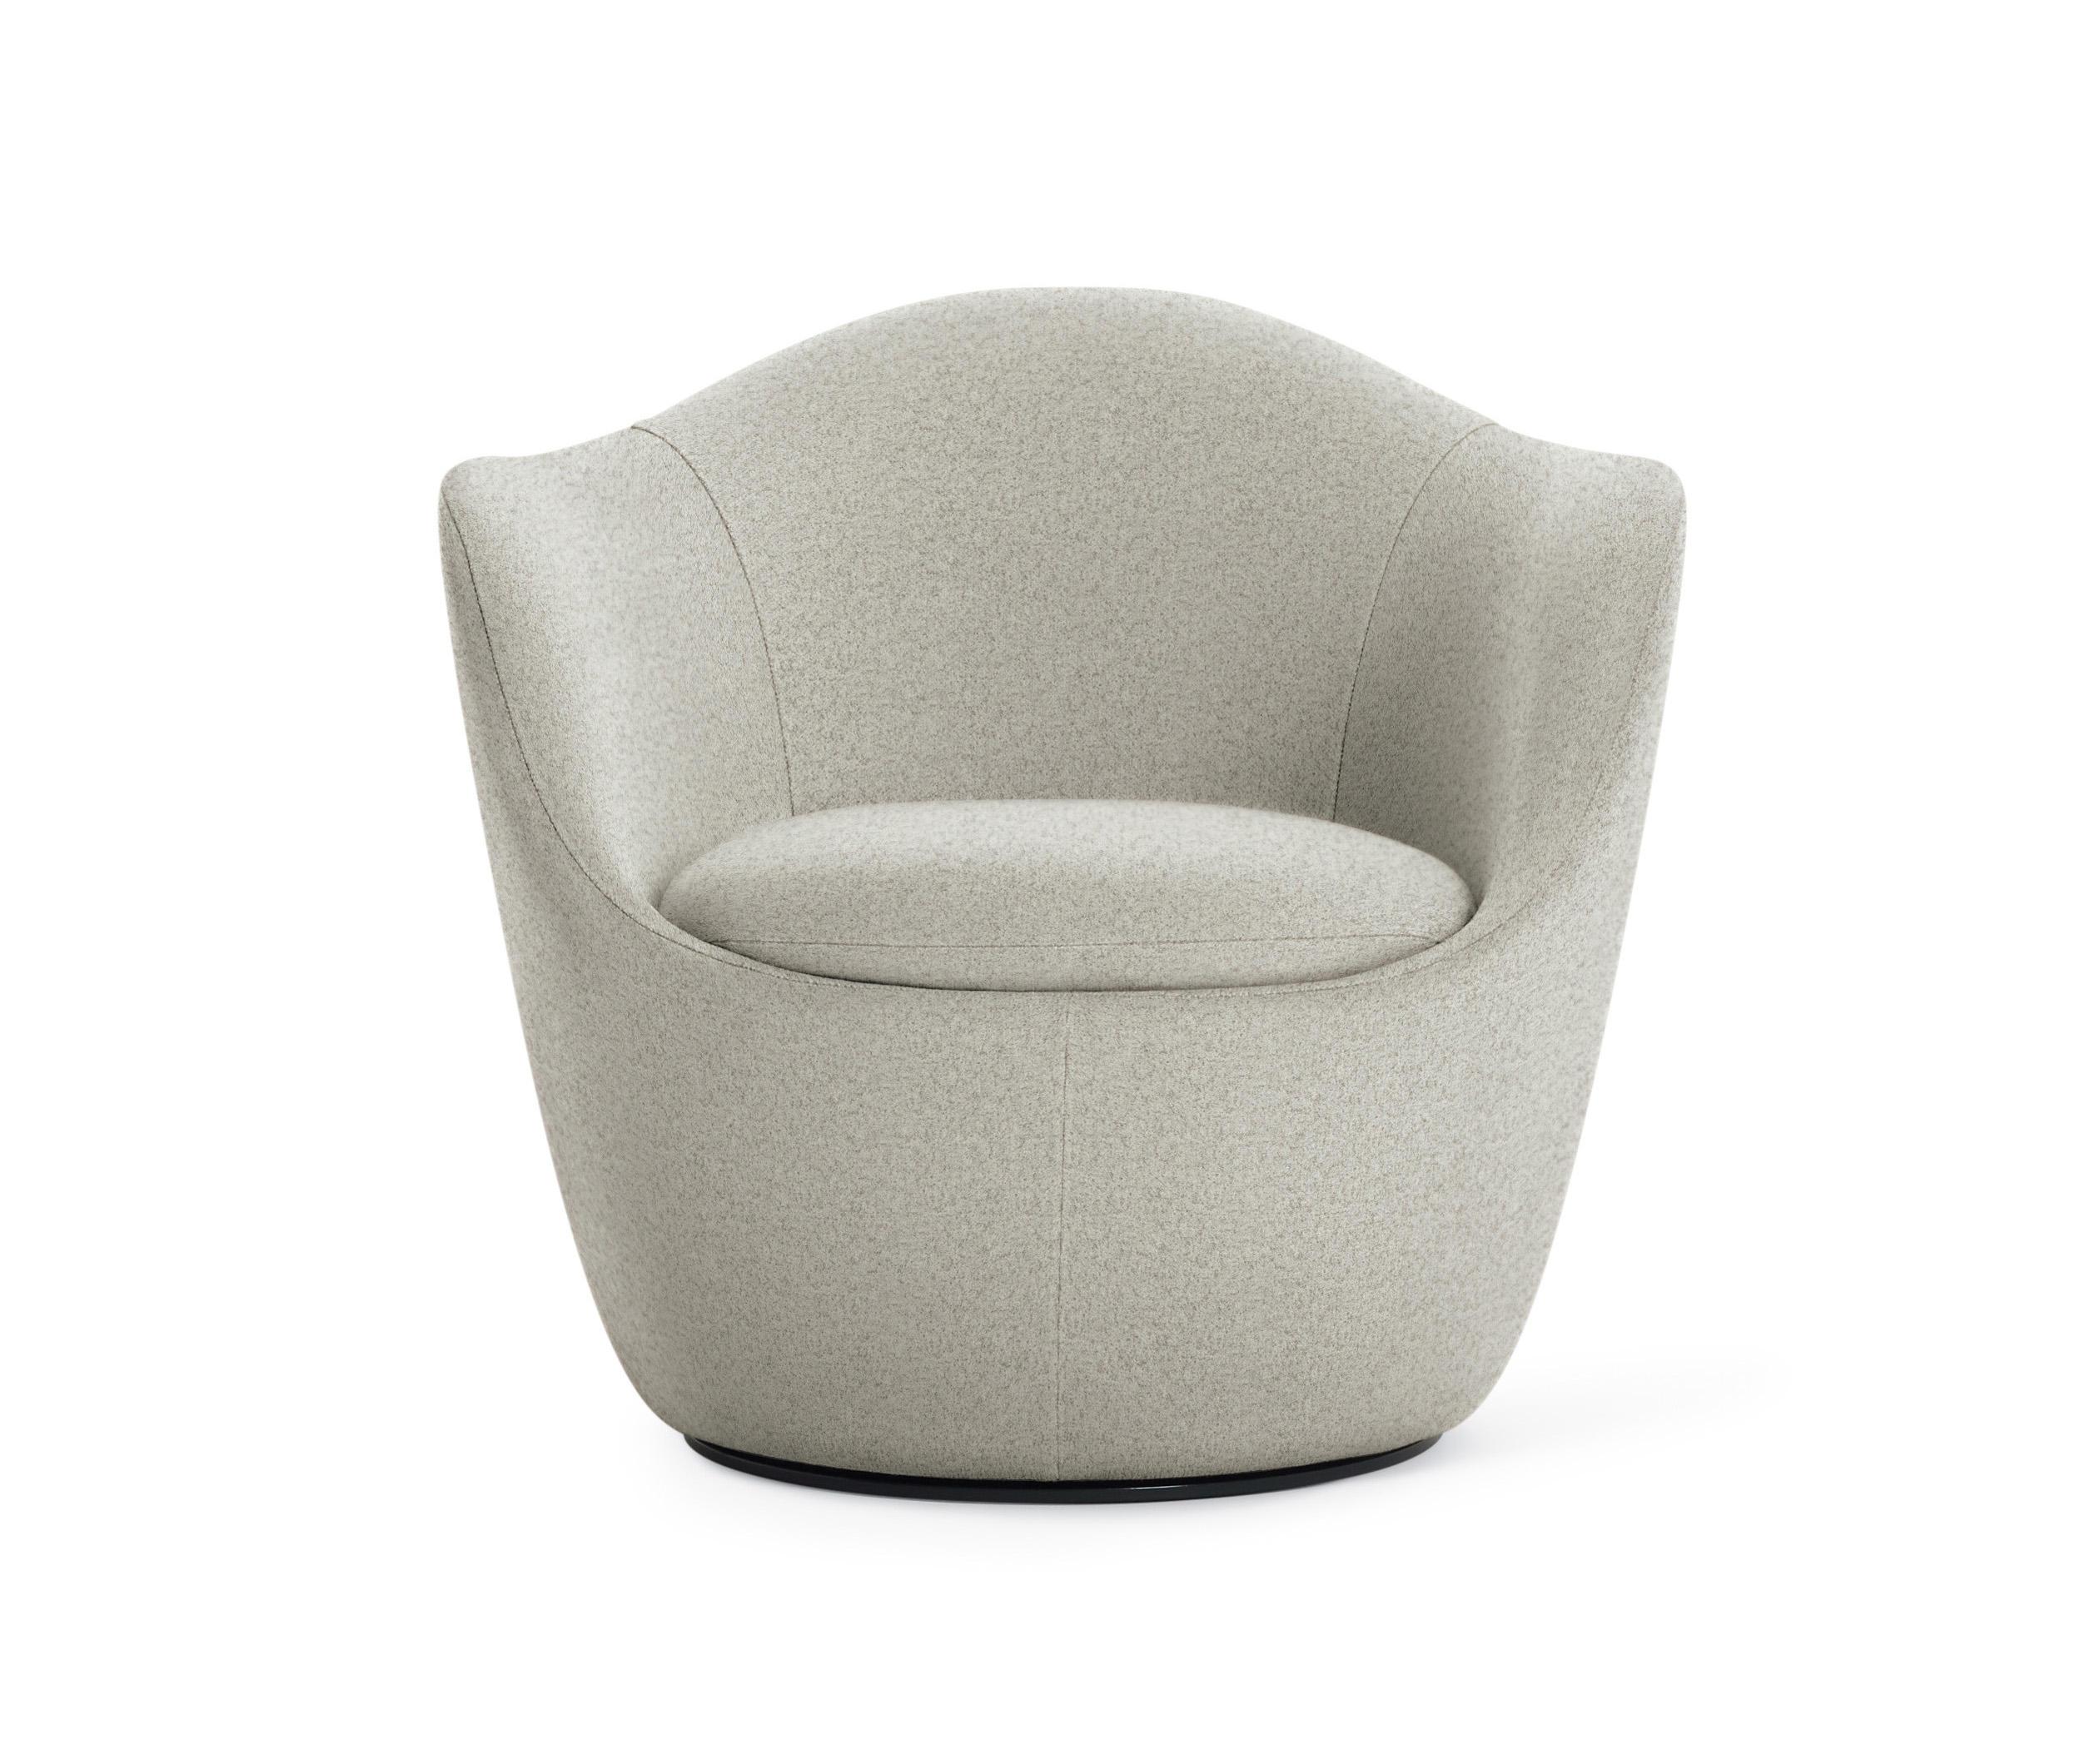 Wondrous Lina Swivel Chair Designer Furniture Architonic Dailytribune Chair Design For Home Dailytribuneorg